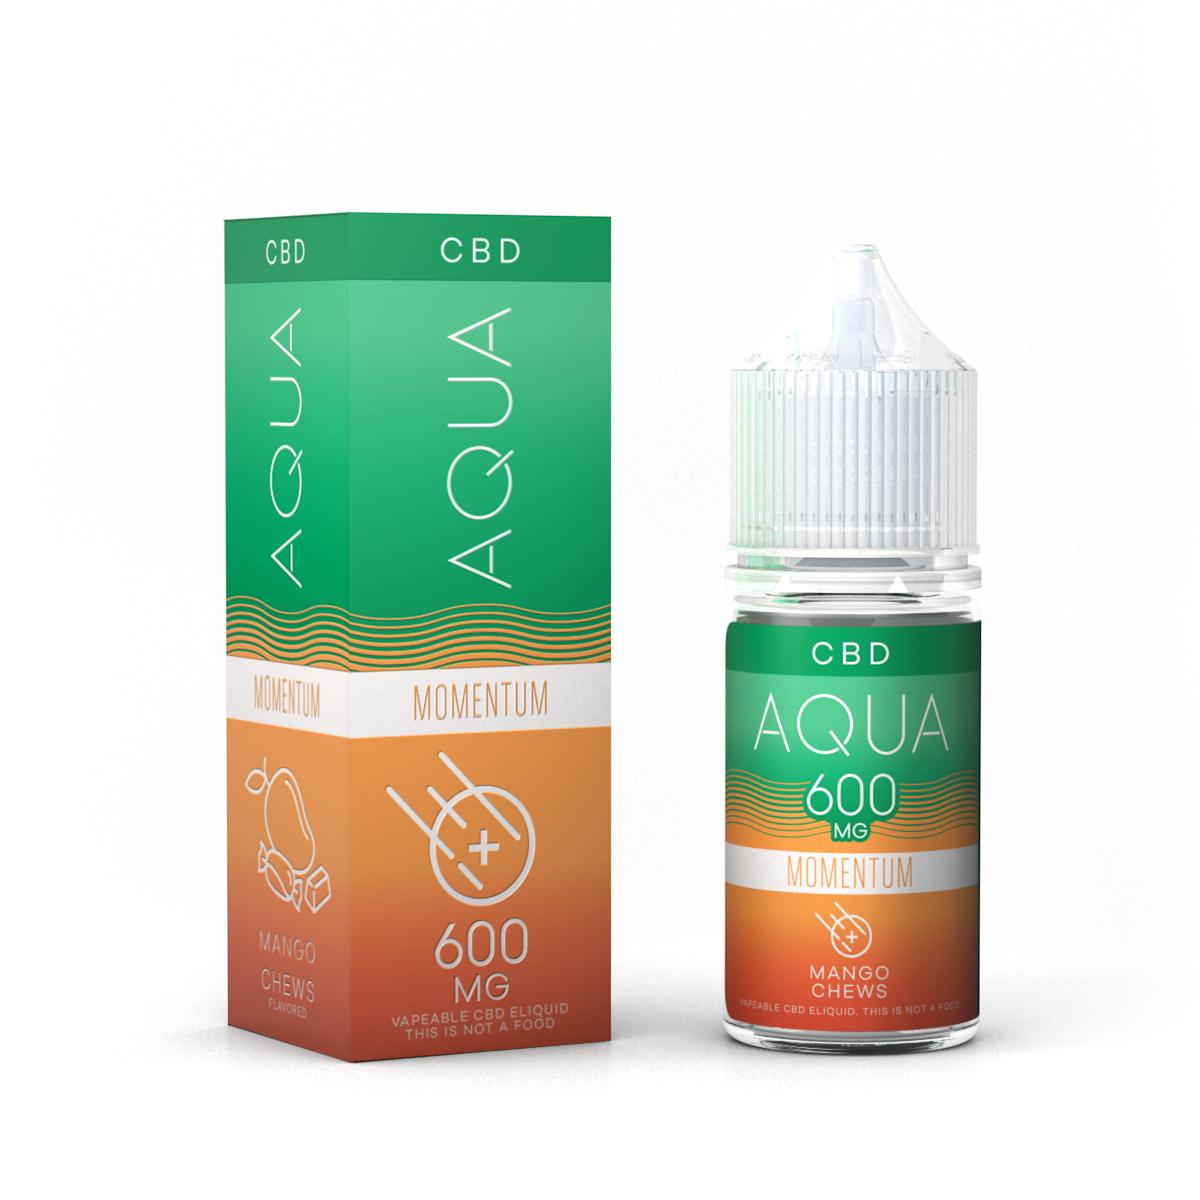 Aqua-CBD-600mg-Momentum.jpg